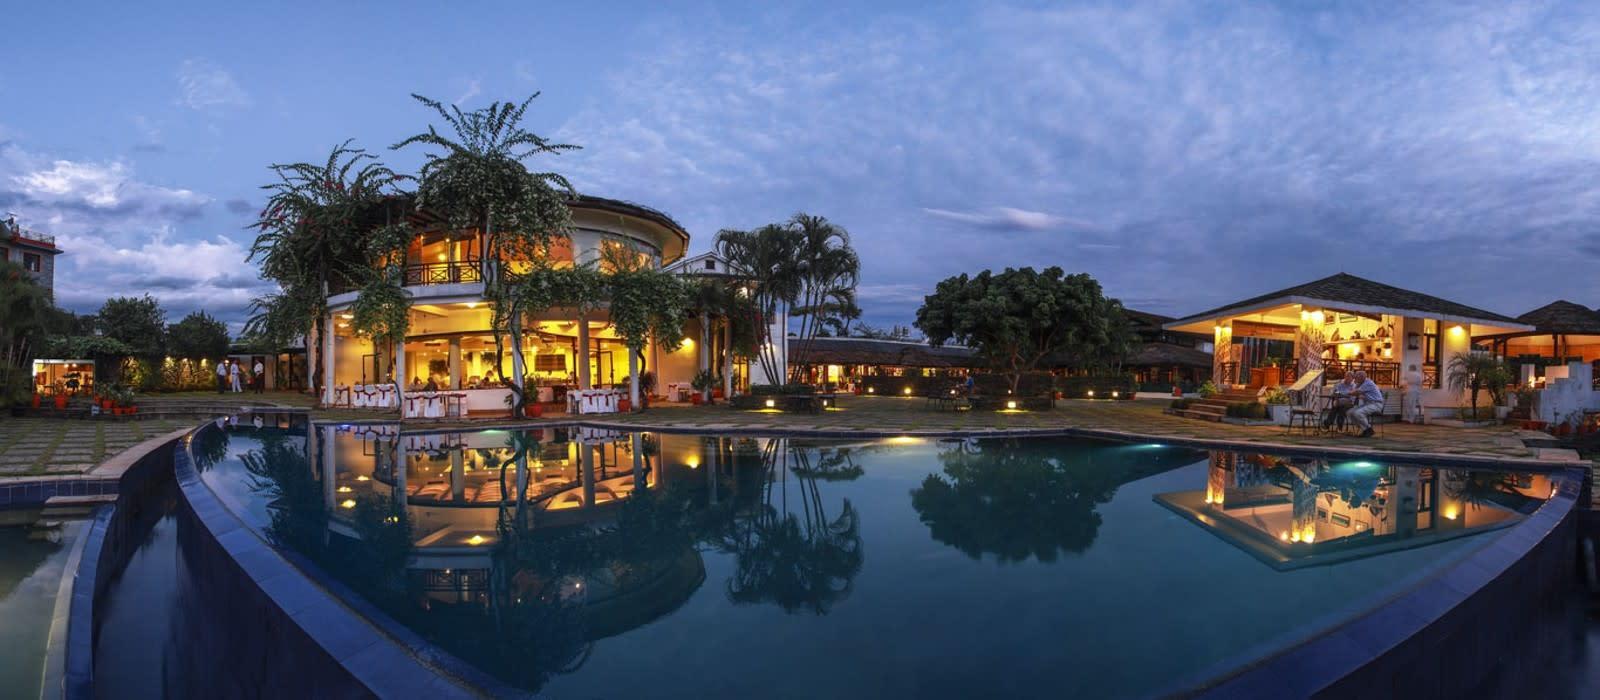 Hotel Shangrila Nepal